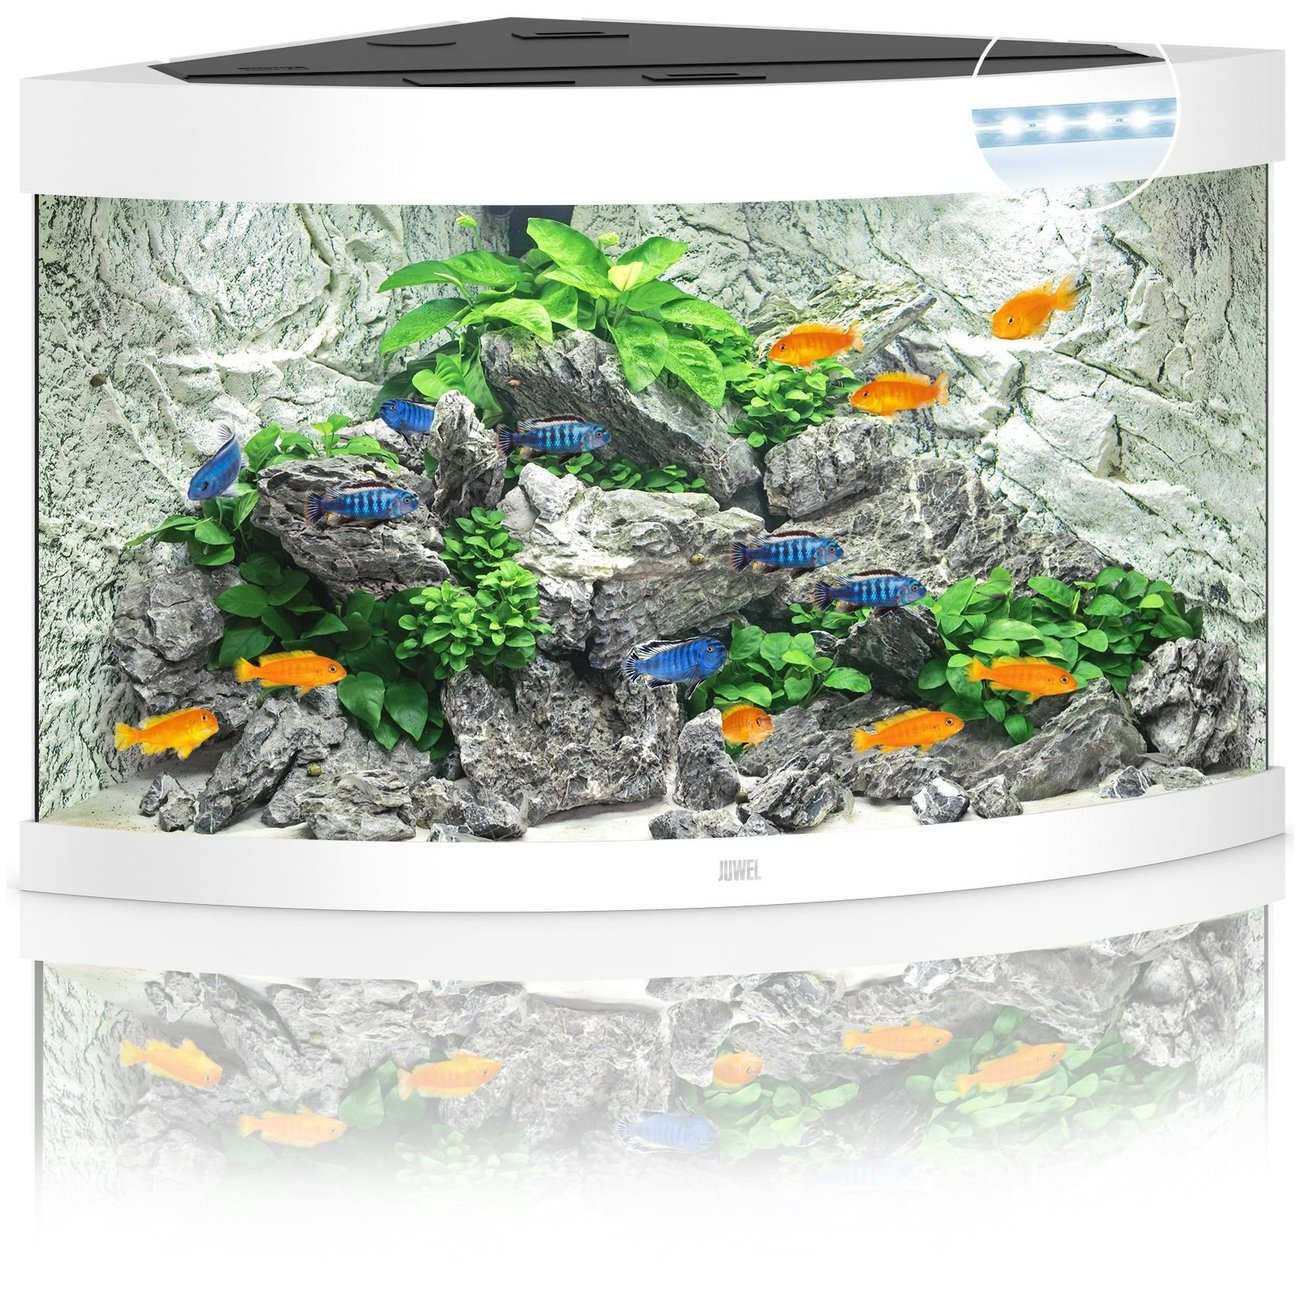 JUWEL Trigon 190 LED Aquarium, 190 Liter, weiß